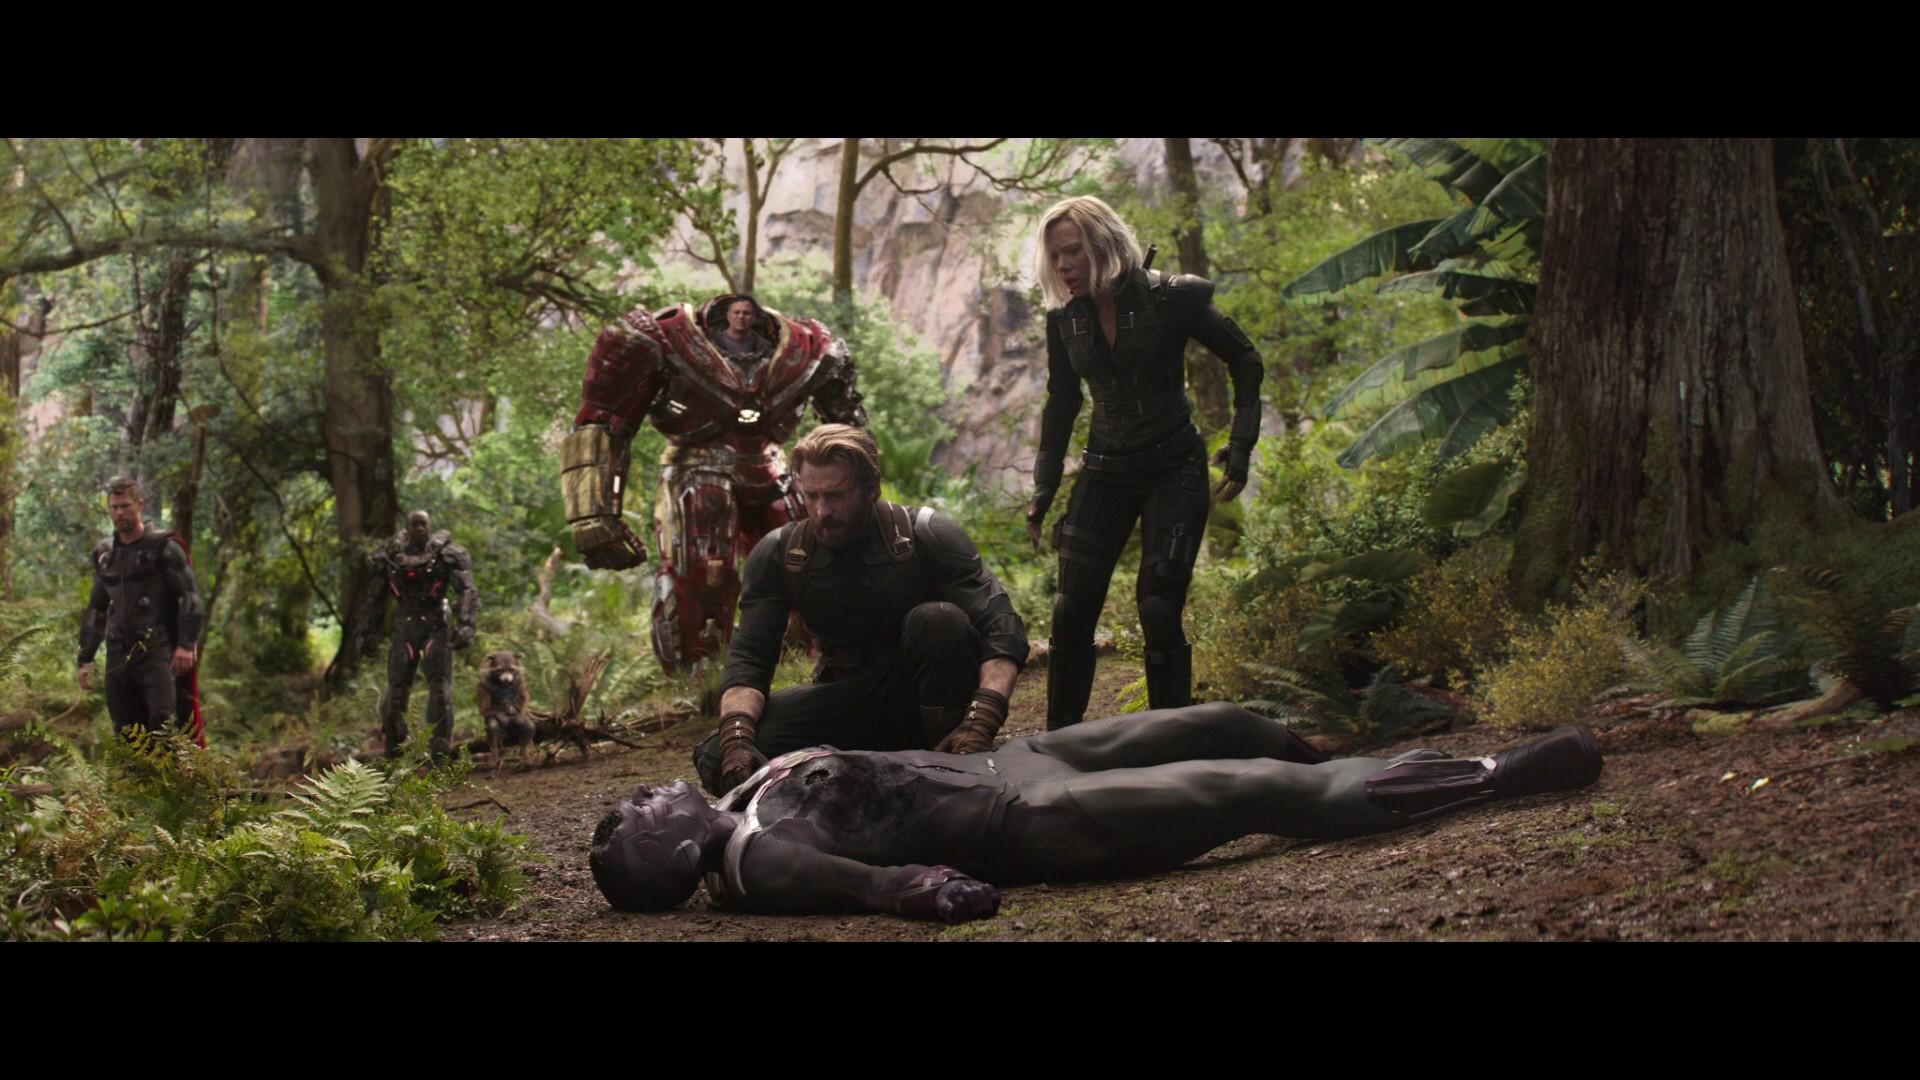 Avengers infinity war blu ray download 1080p   Blu  2019-05-11